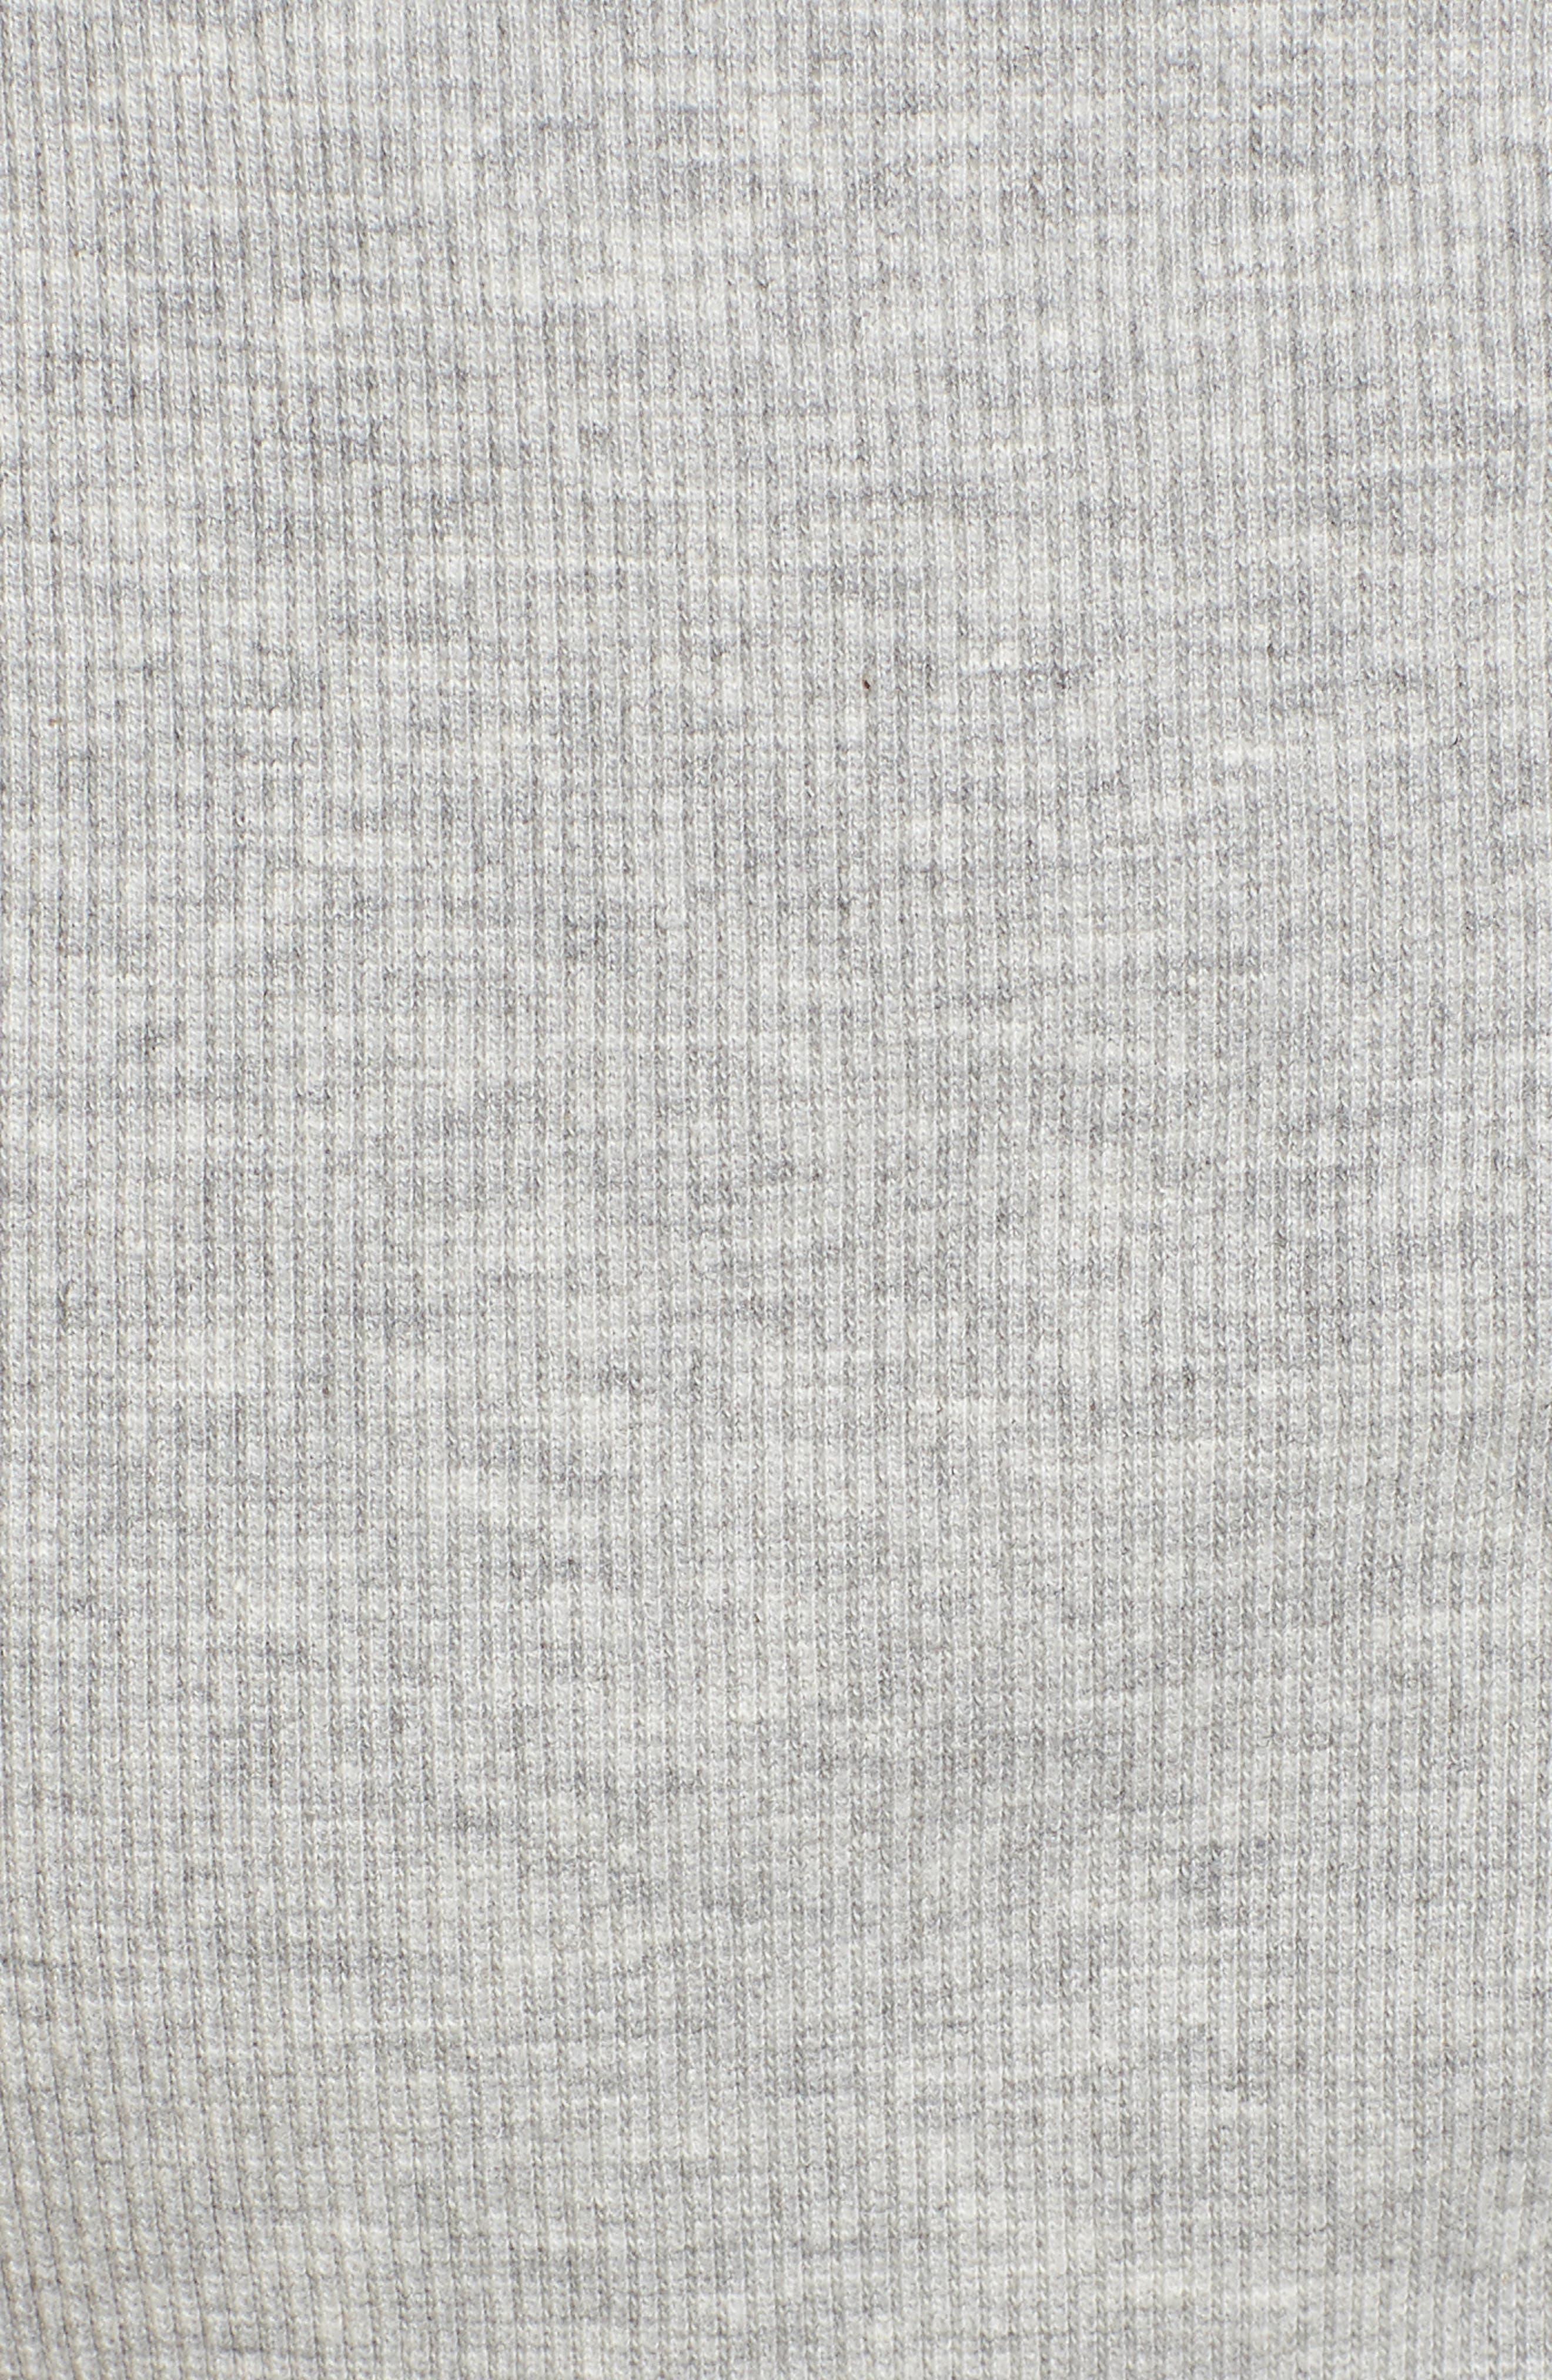 Cross Back Hooded Crop Top,                             Alternate thumbnail 6, color,                             020